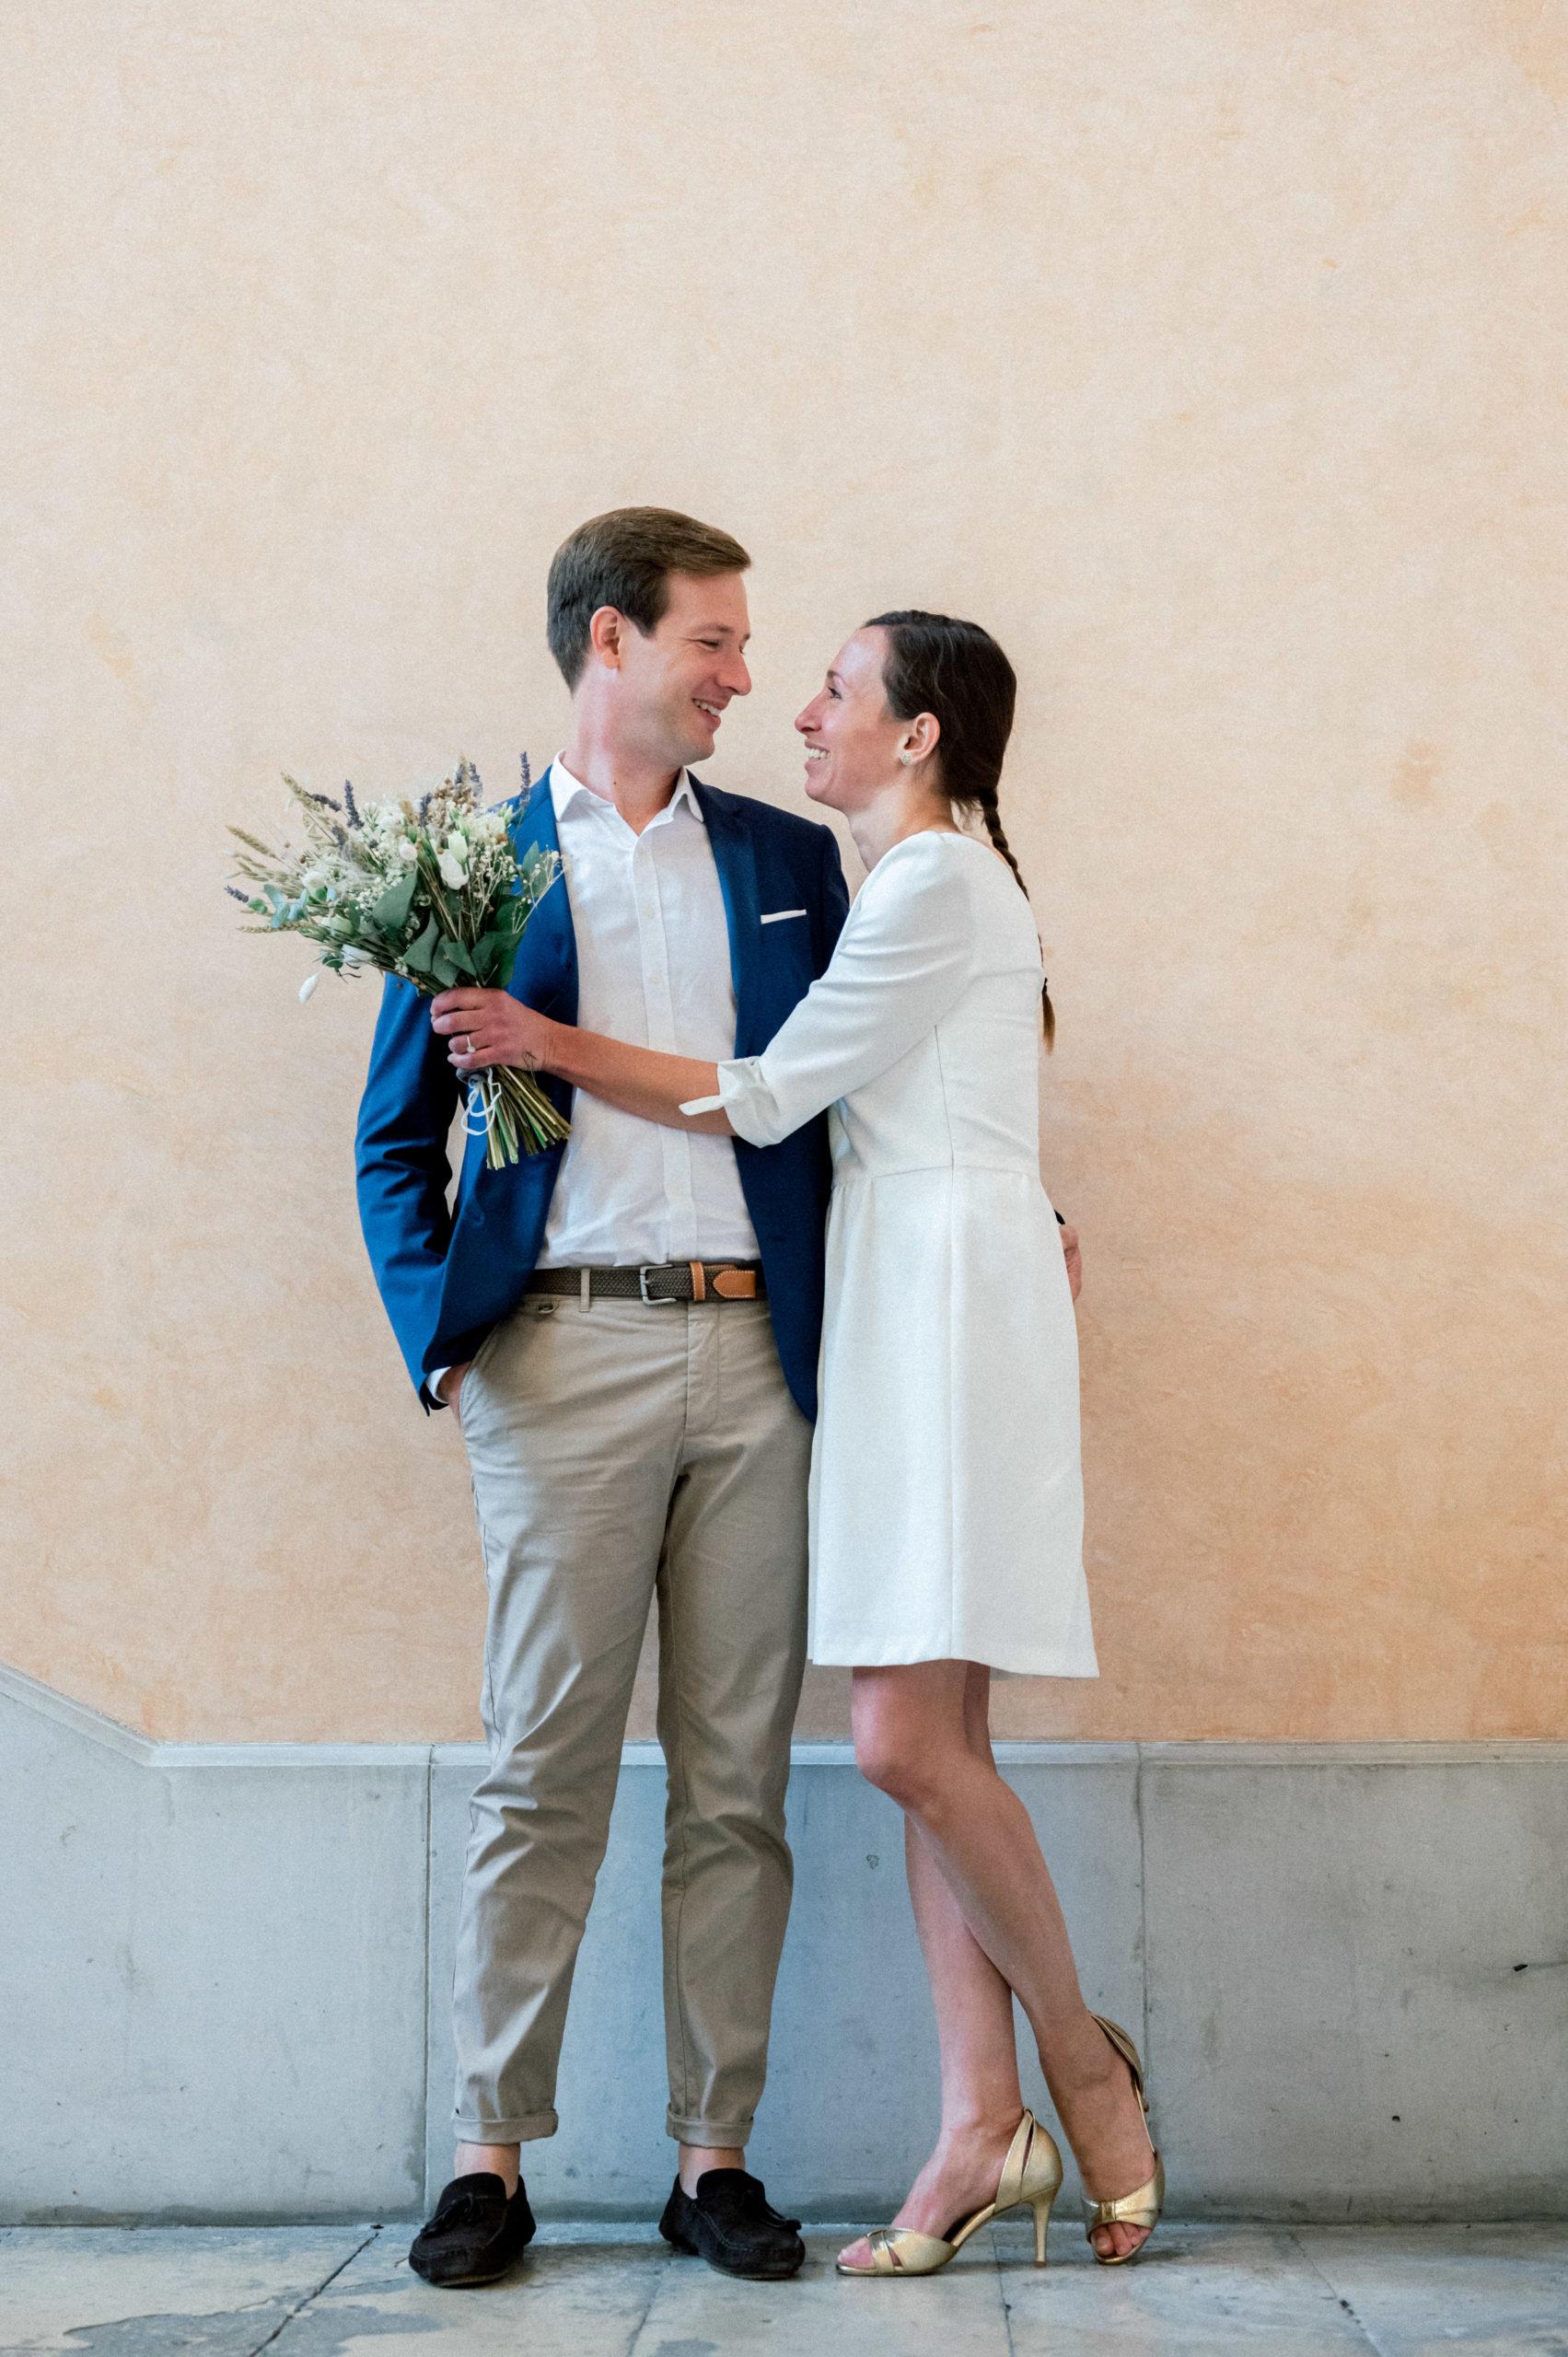 Mariage à Nimes par Sylvia Calmet photographe de mariage en Provence